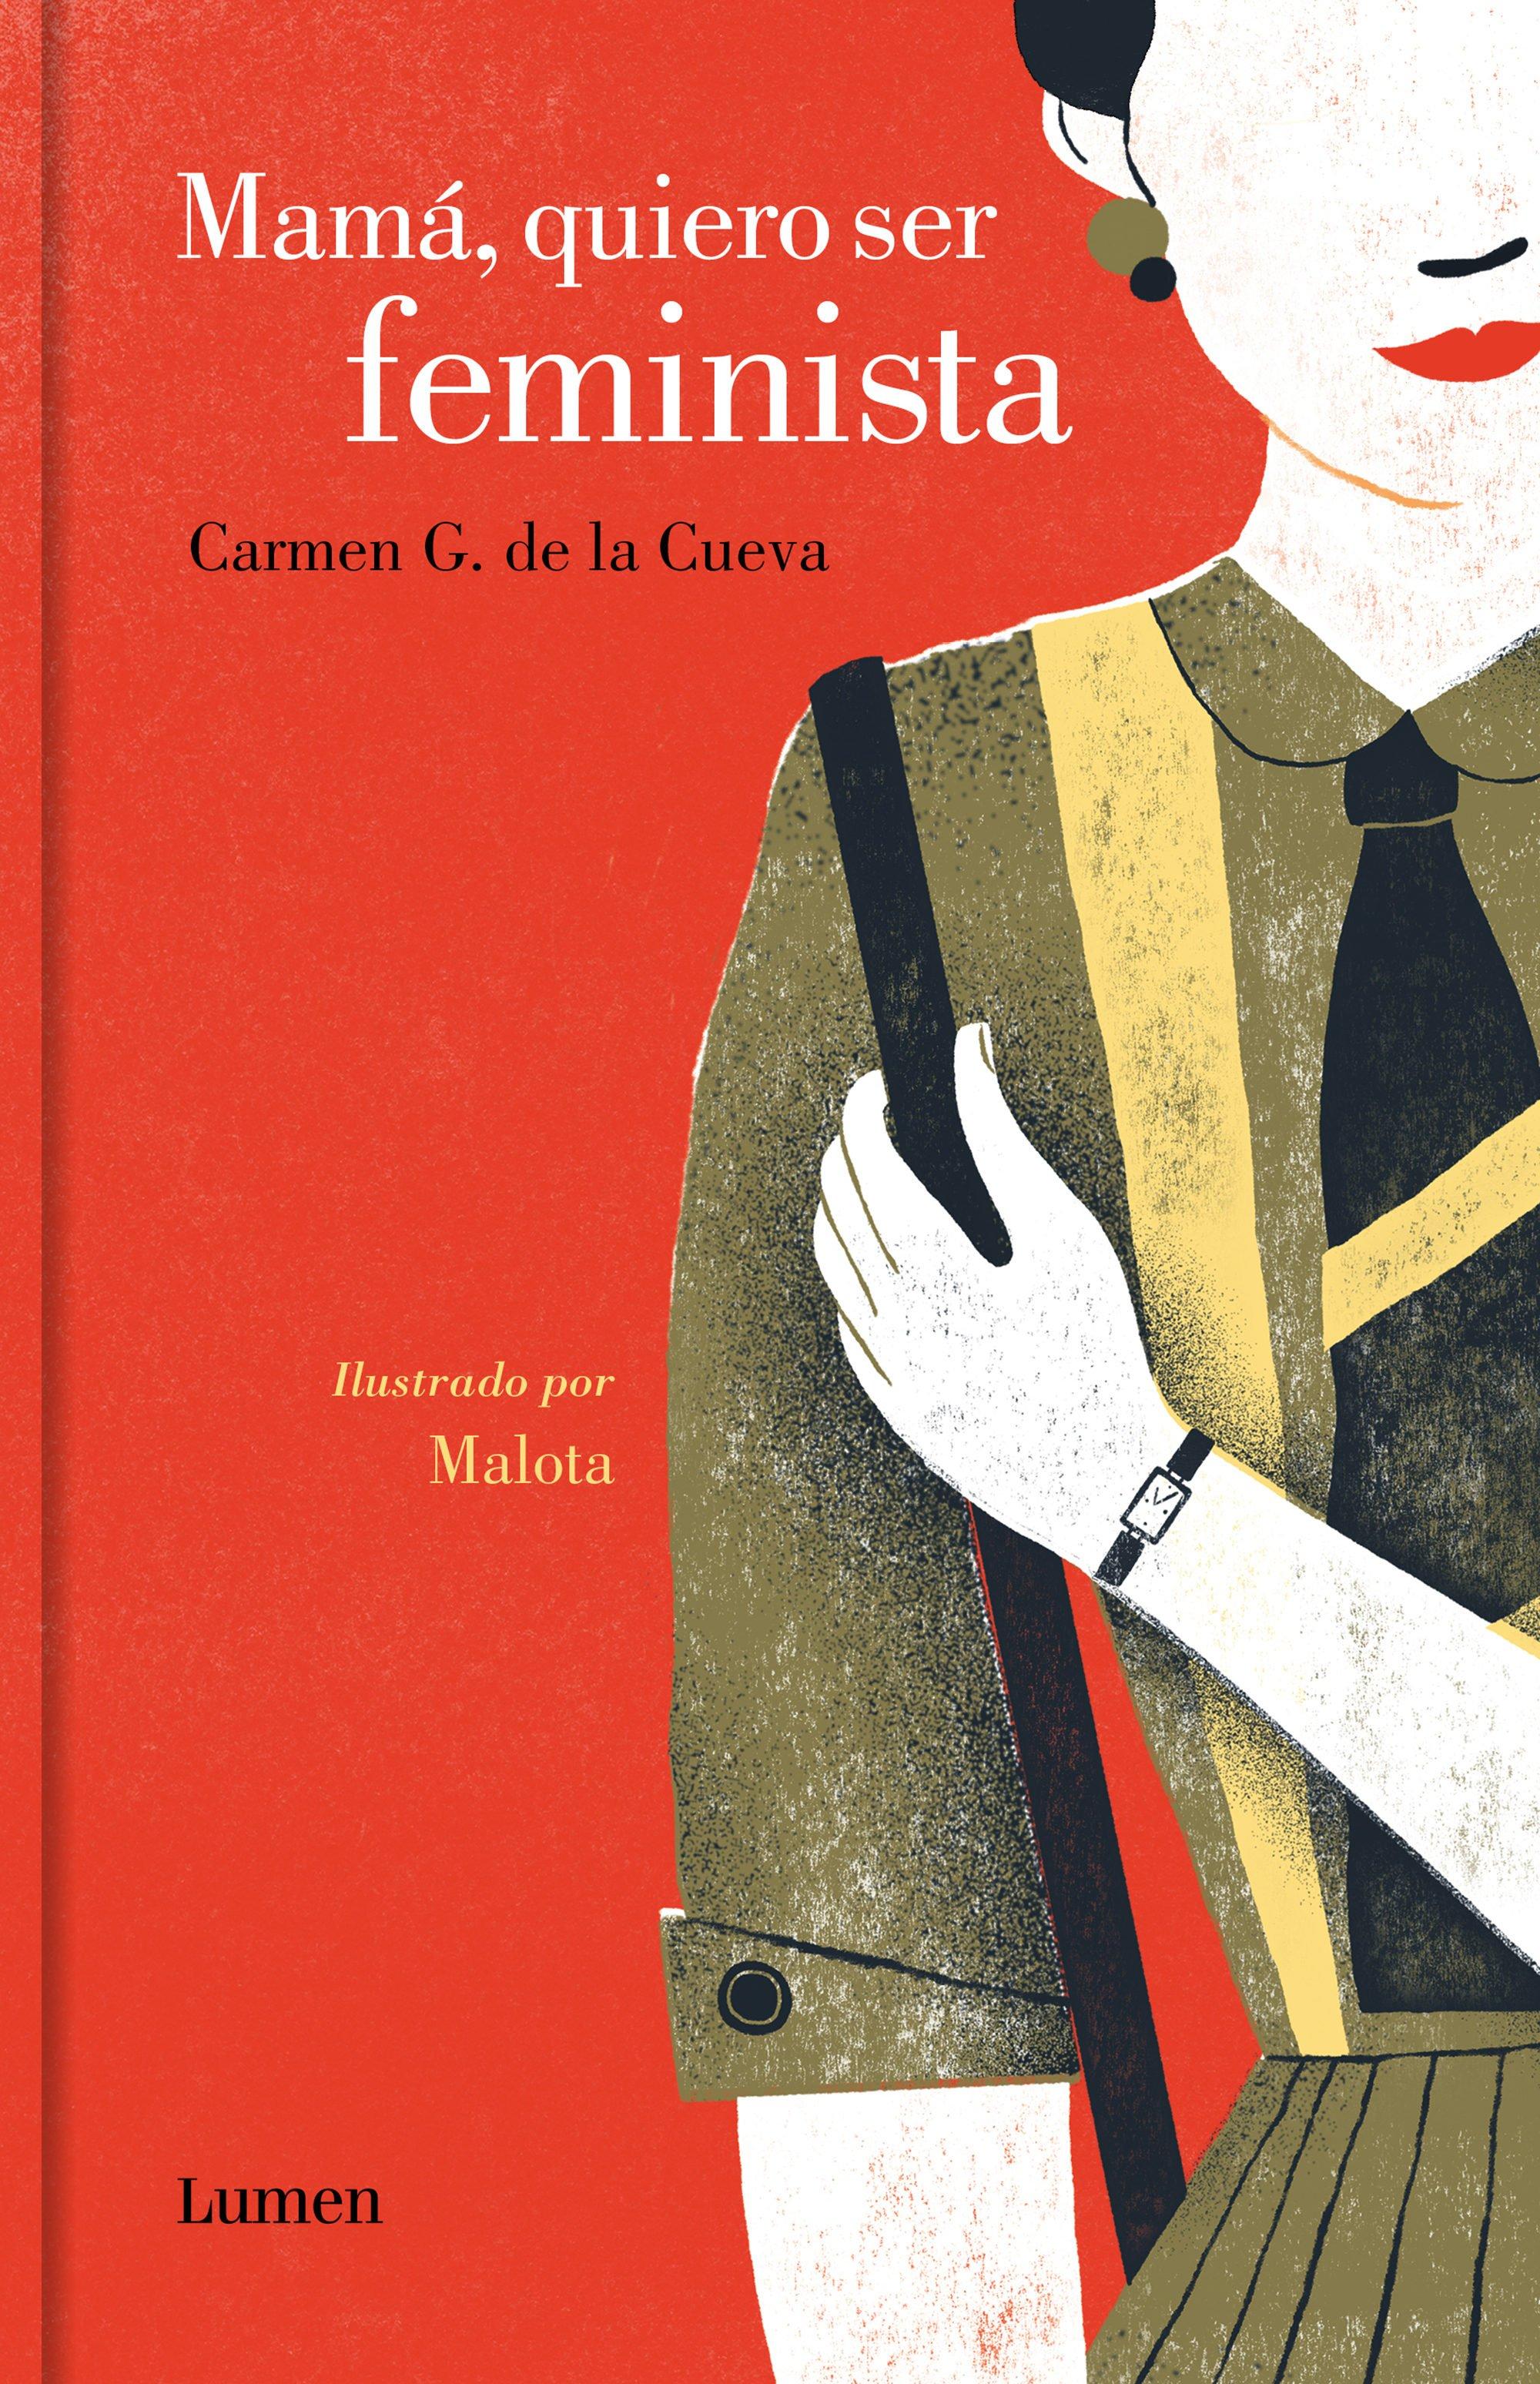 Mamá, quiero ser feminista,Carmen G. de la Cueva